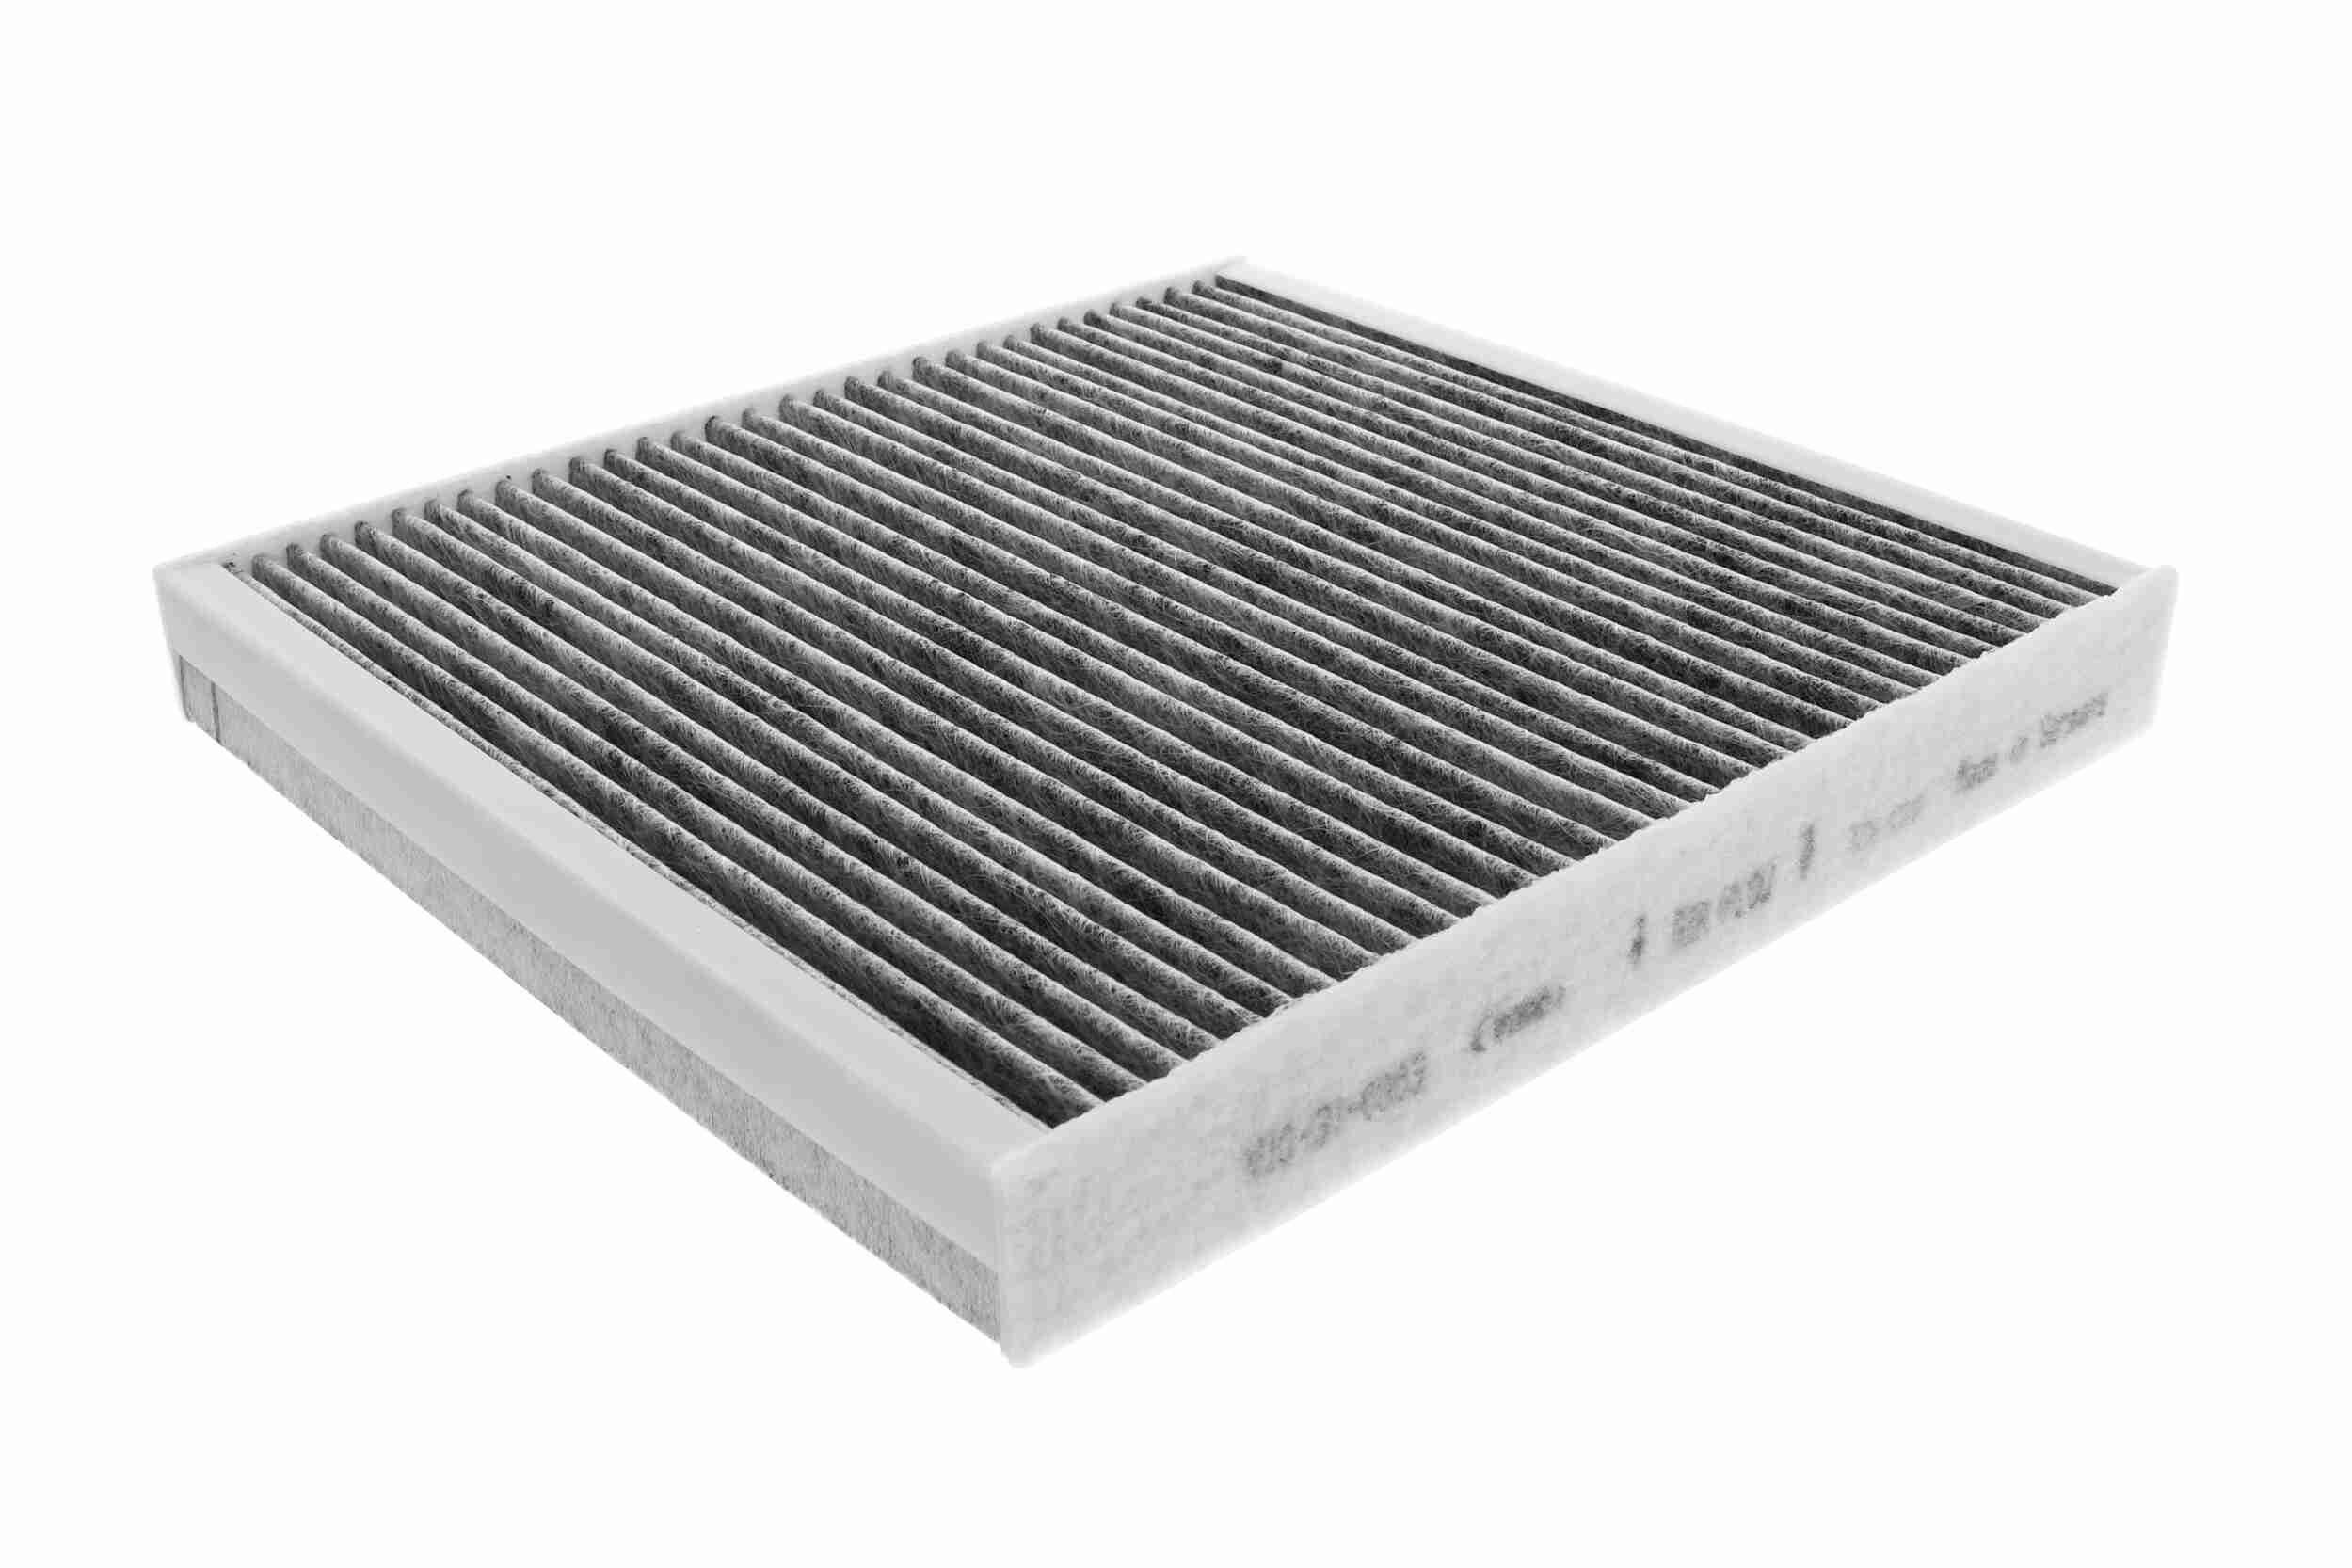 Филтри за климатици V10-31-0003 VEMO — само нови детайли